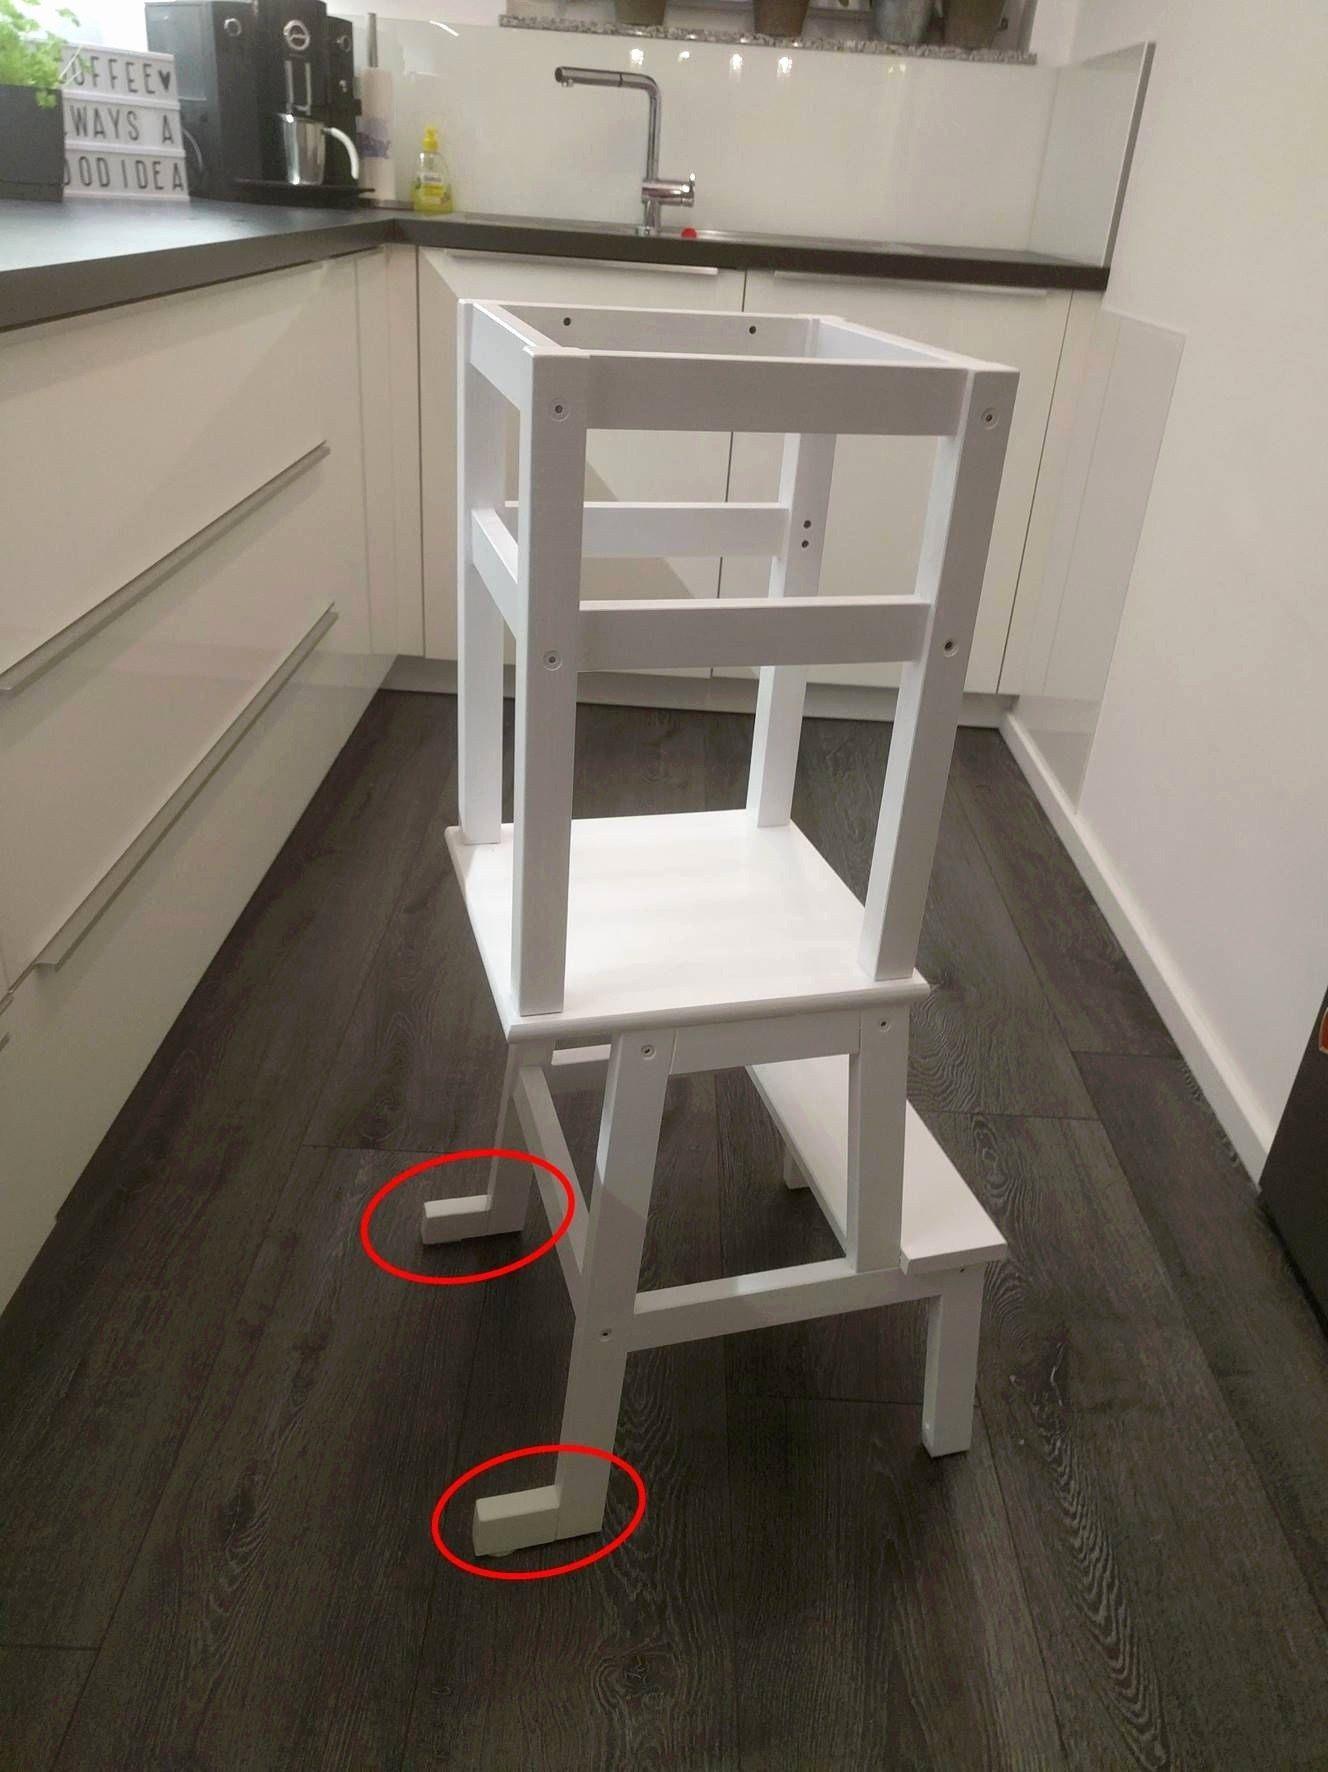 Lit Mezzanine Avec Armoire Bel Lit En Hauteur Avec Bureau Ikea